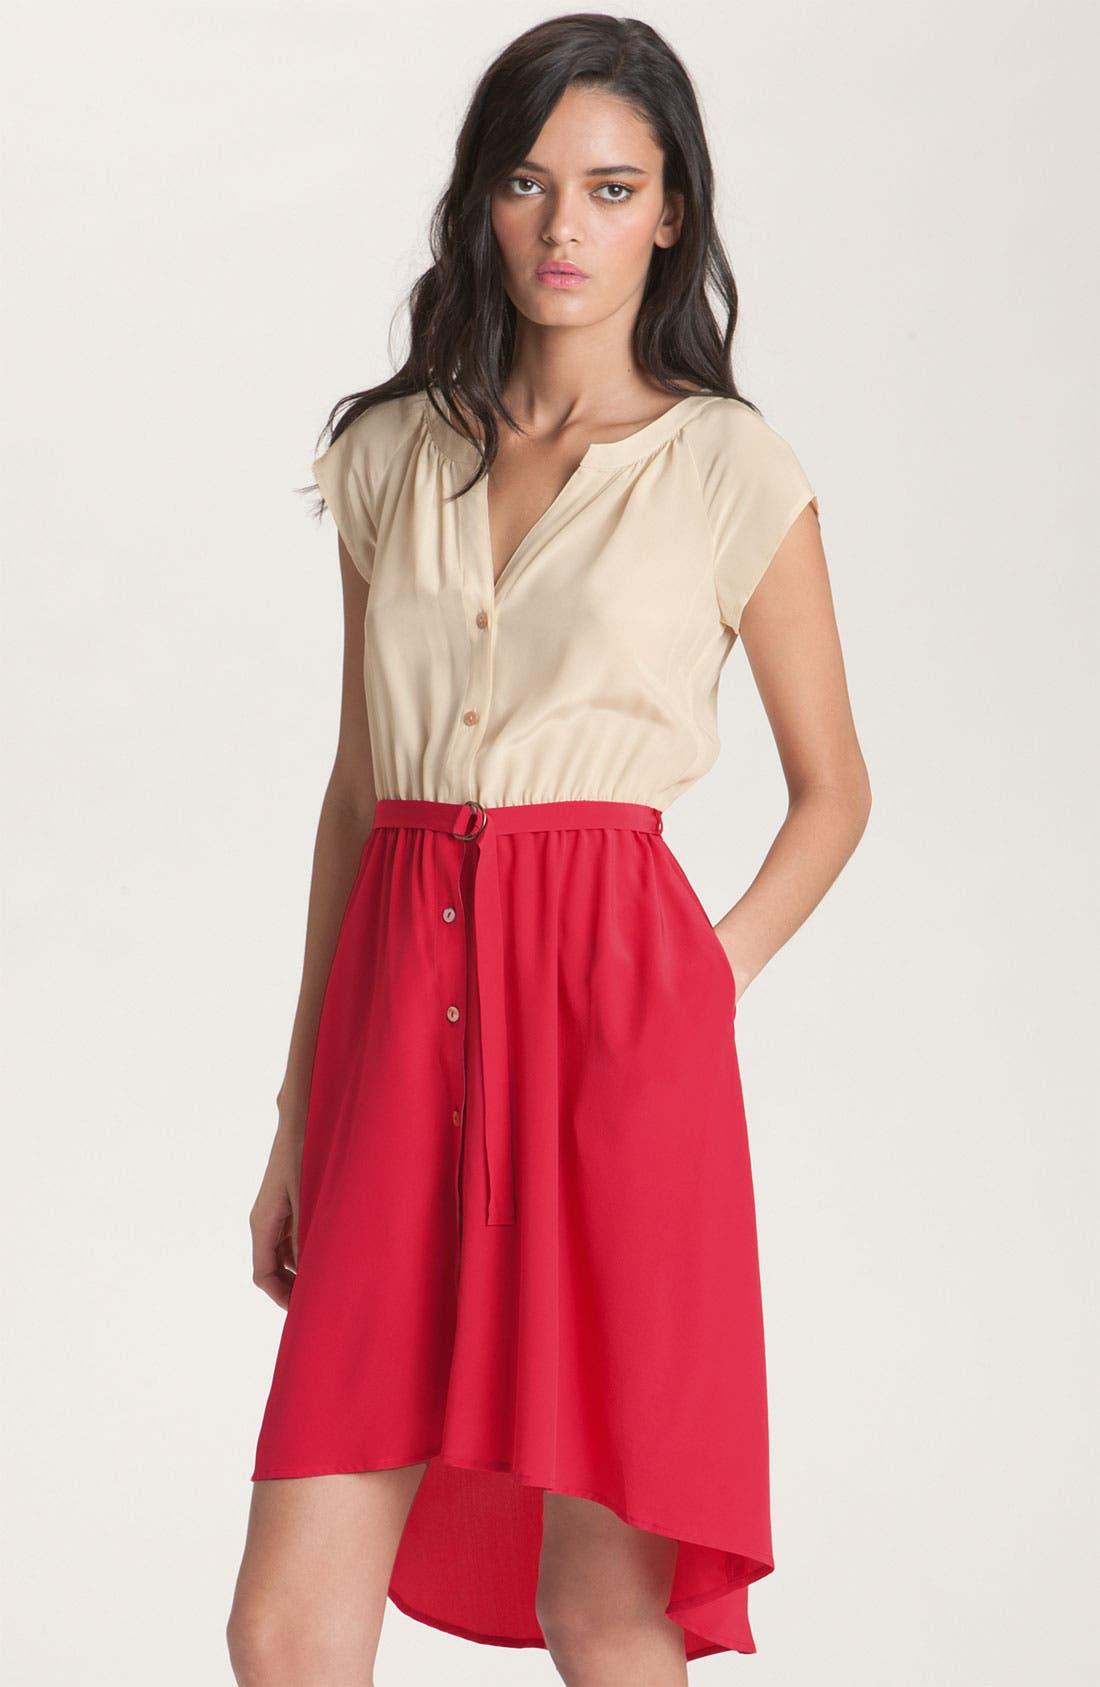 Alternate Image 1 Selected - Presley Skye Belted Colorblock Silk Dress